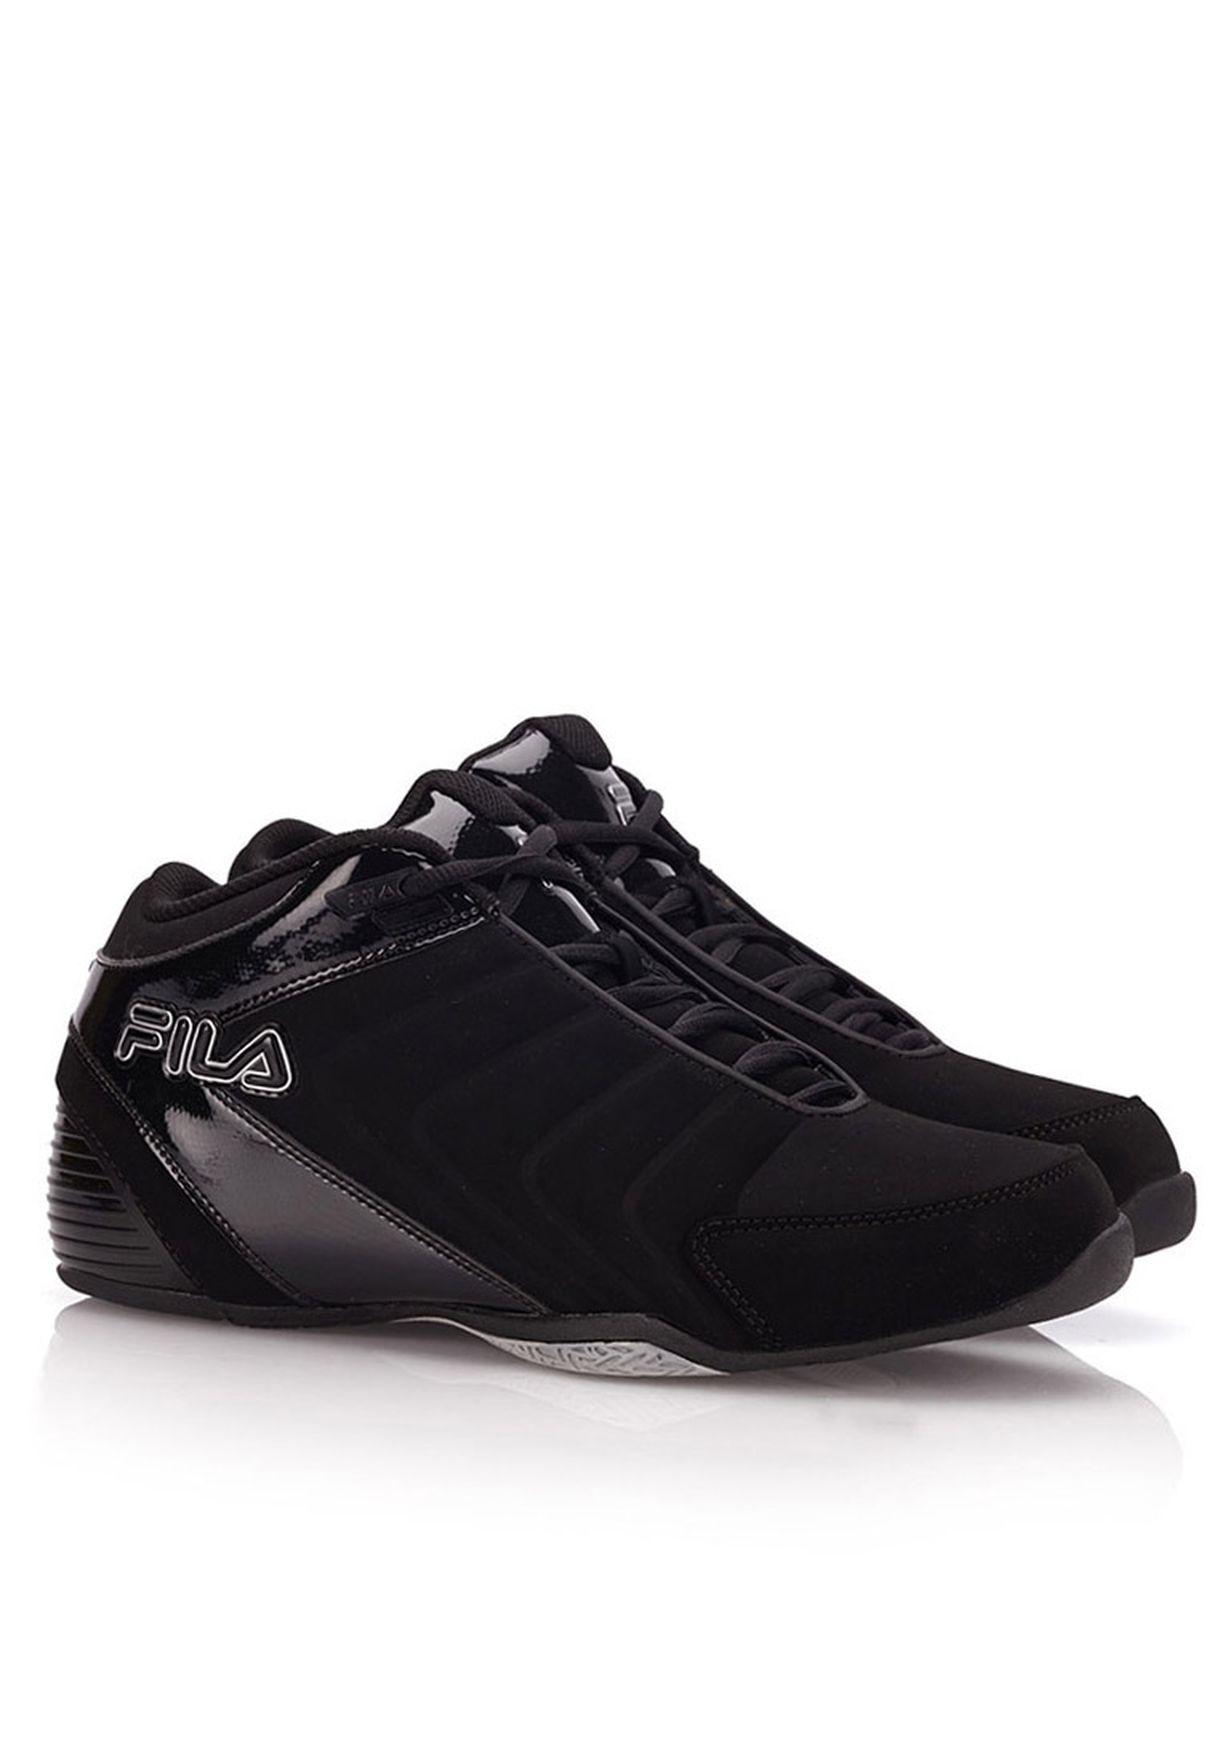 dd74fa0c5 تسوق Sports Shoes ماركة فيلا لون أسود 1SB10157-010 في السعودية ...